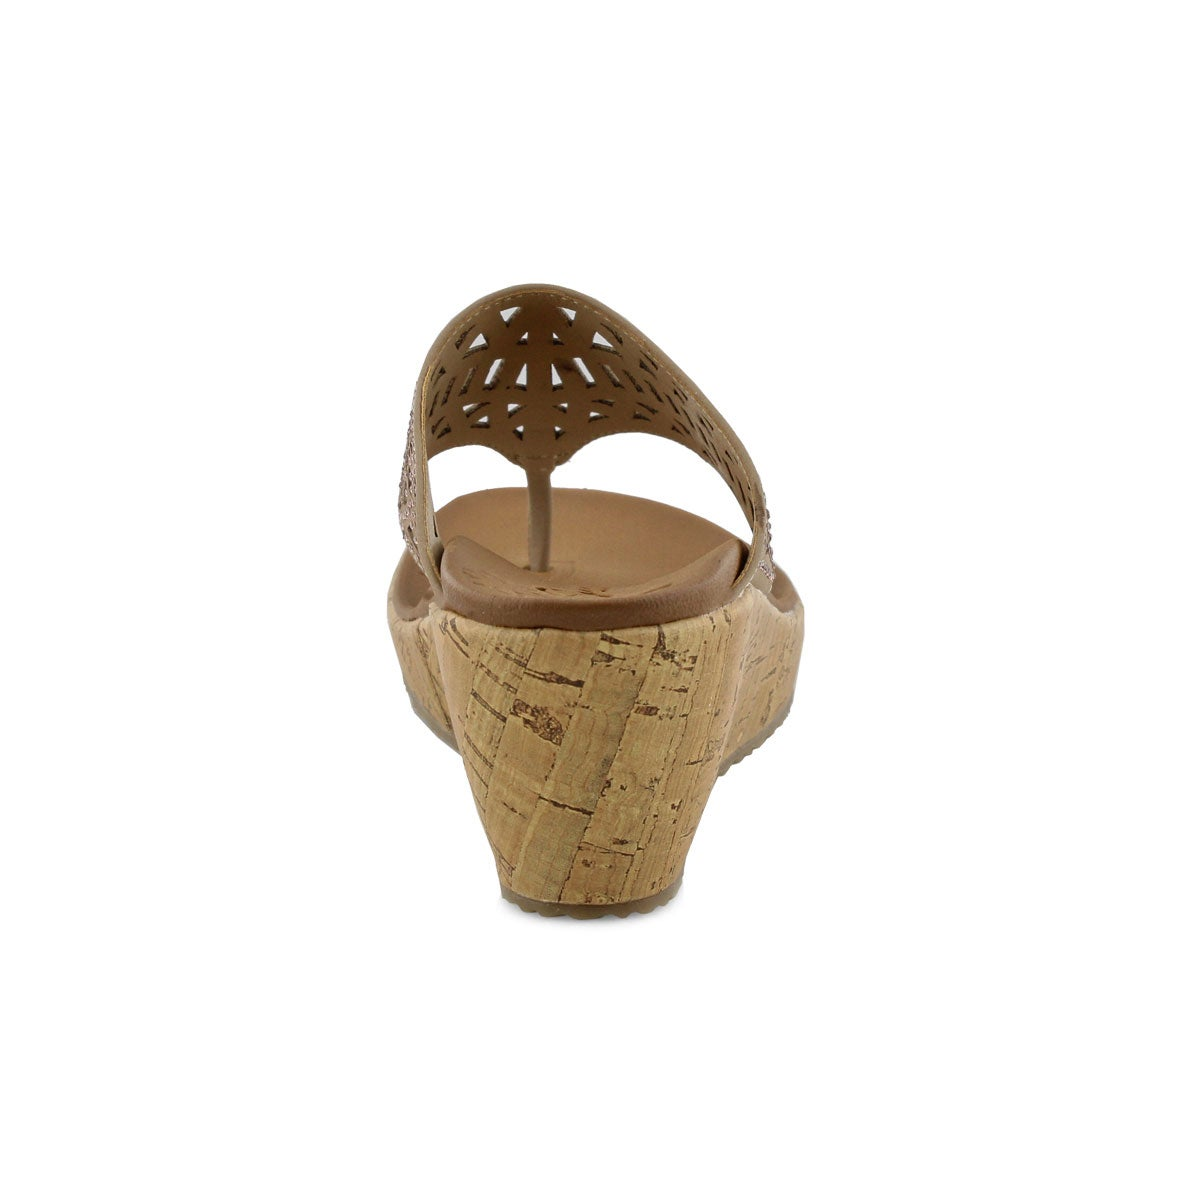 Sandale tong BEVERLEEM, taupe, femmes